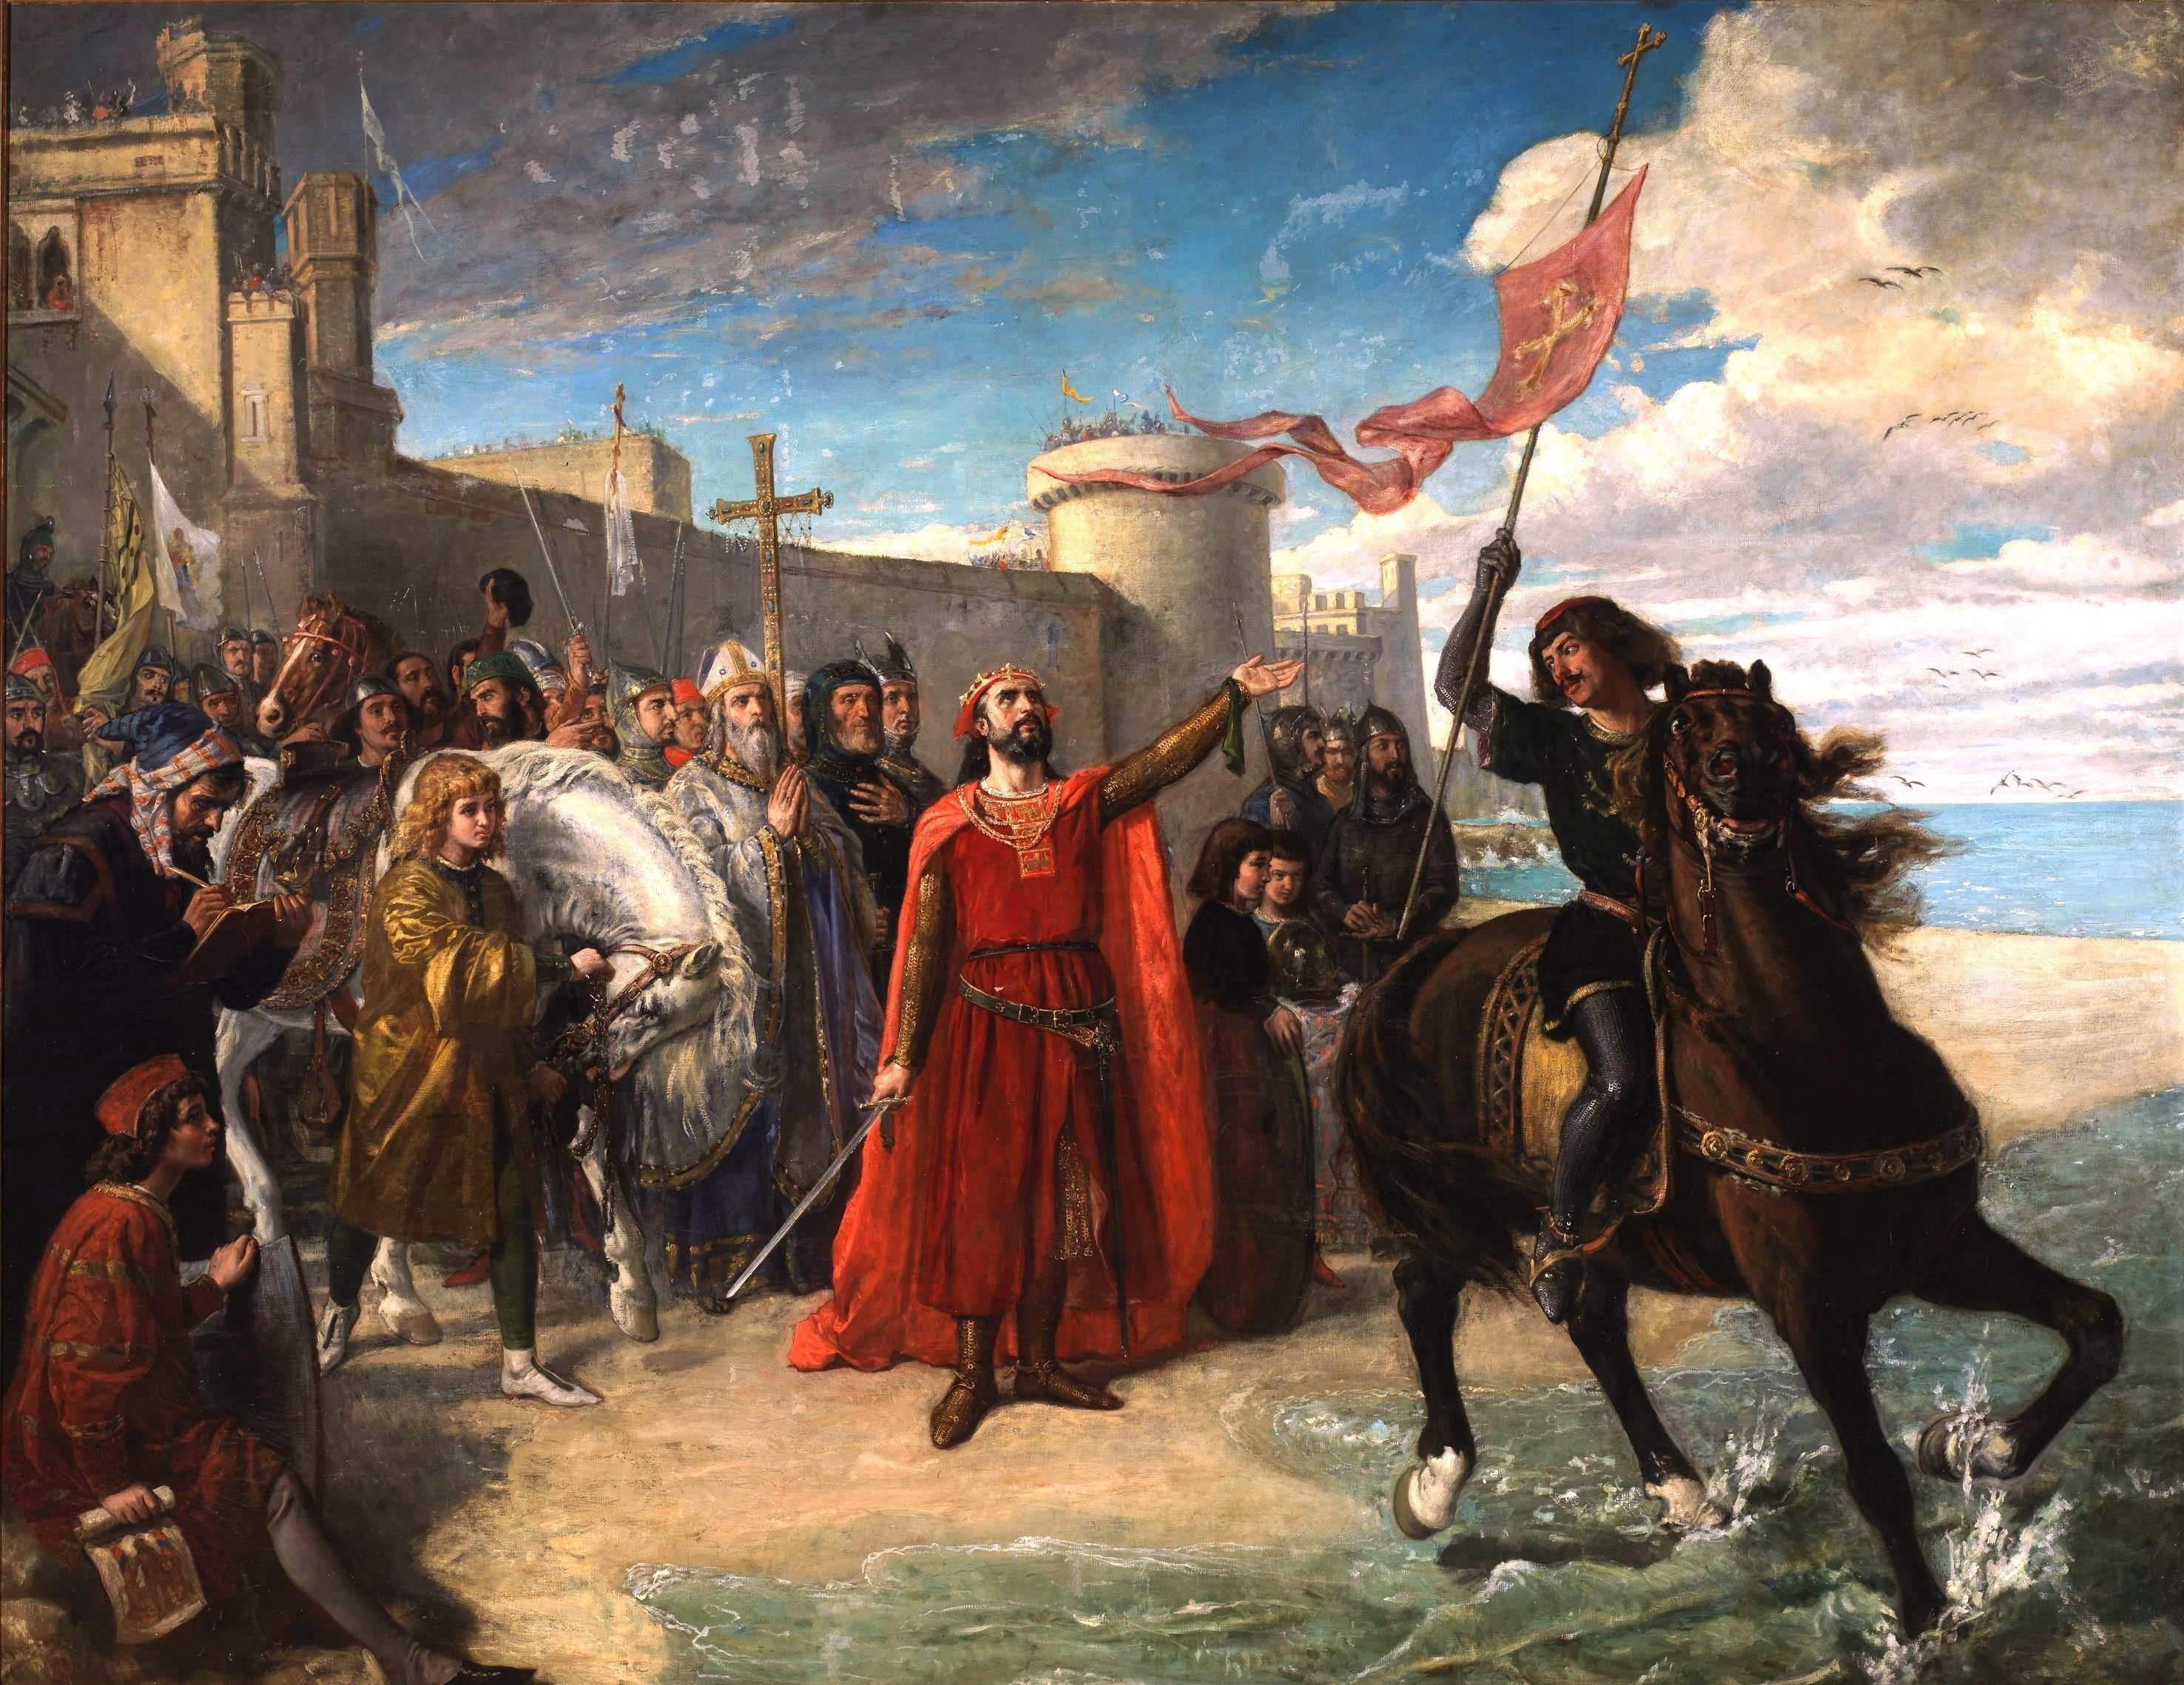 File:Alfonso_X_el_Sabio_tomando_posesi%C3%B3n_del_mar_despu%C3%A9s_de_la_conquista_de_C%C3%A1diz._Mat%C3%ADas_Moreno._1866 on 1492 In Art